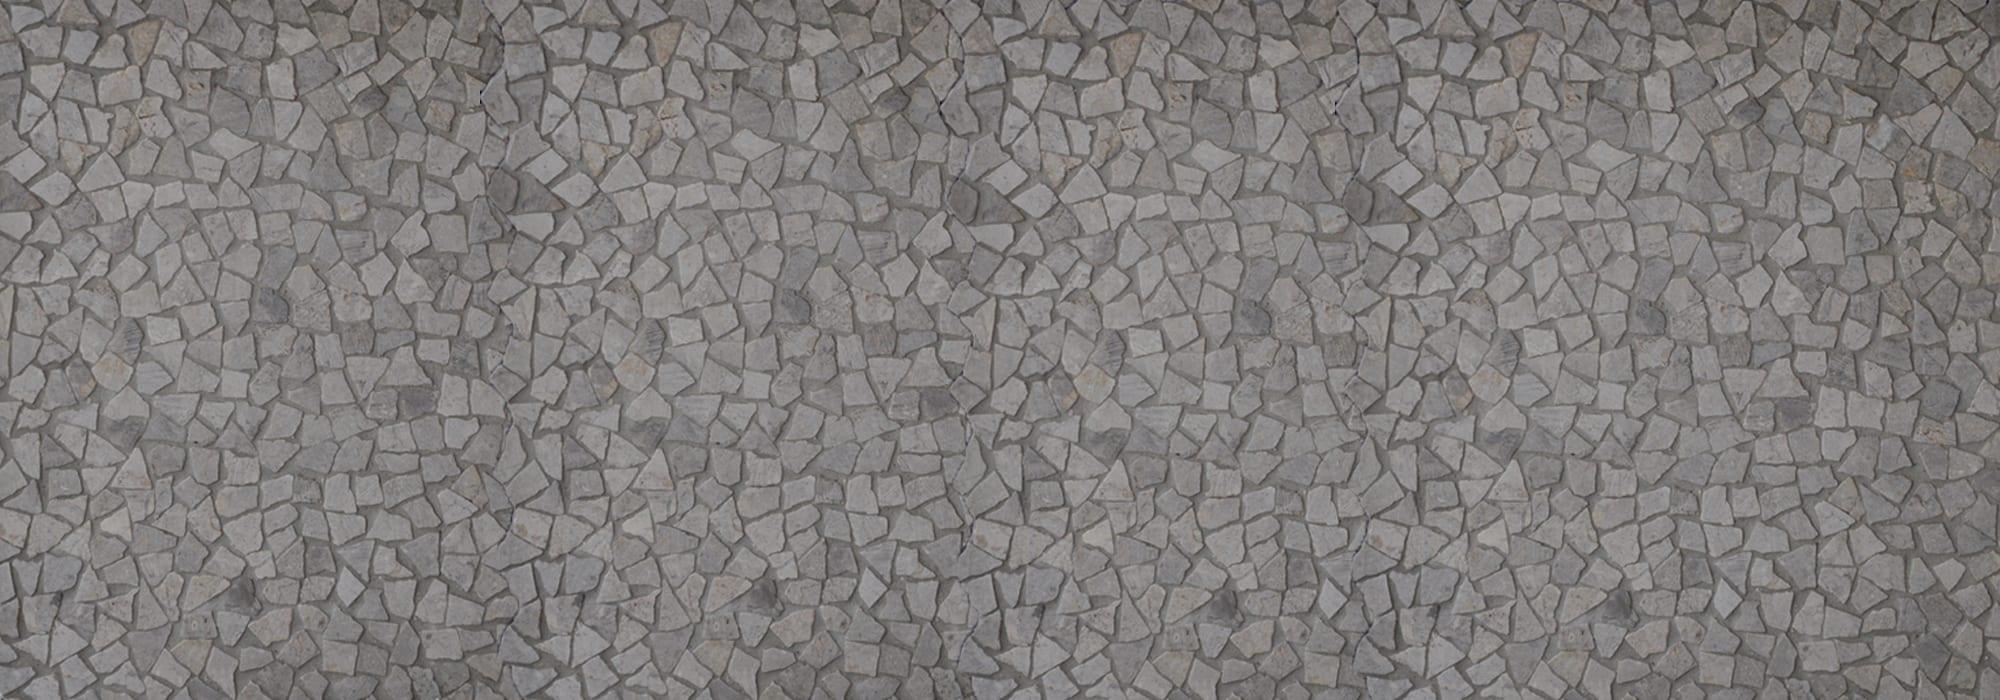 Micro Brescia XS Combined Mosaic by Milstone